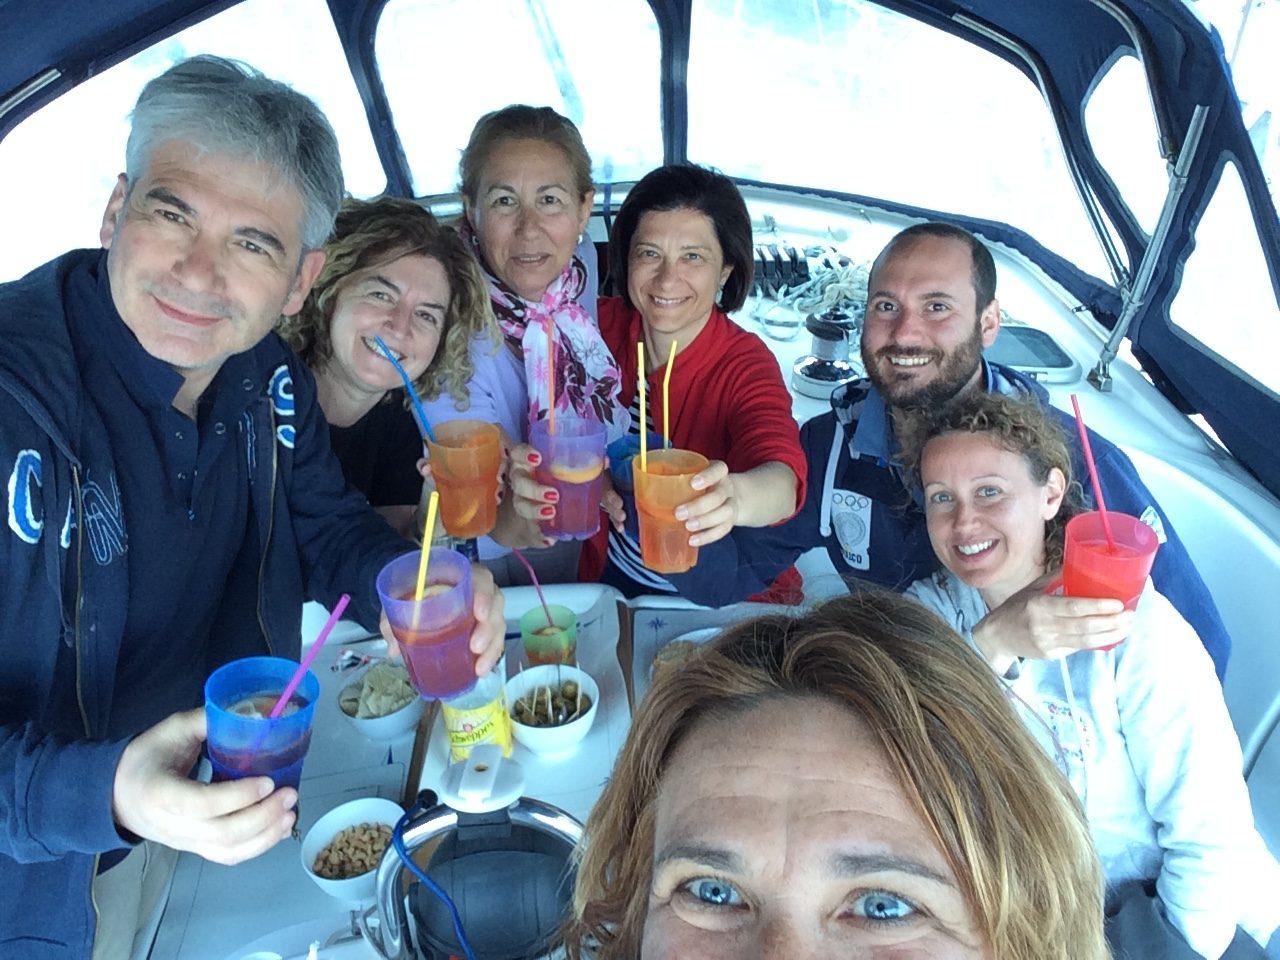 Giacomo, Giulia, Pasquale, Rosaria, Annamaria, Clorinda